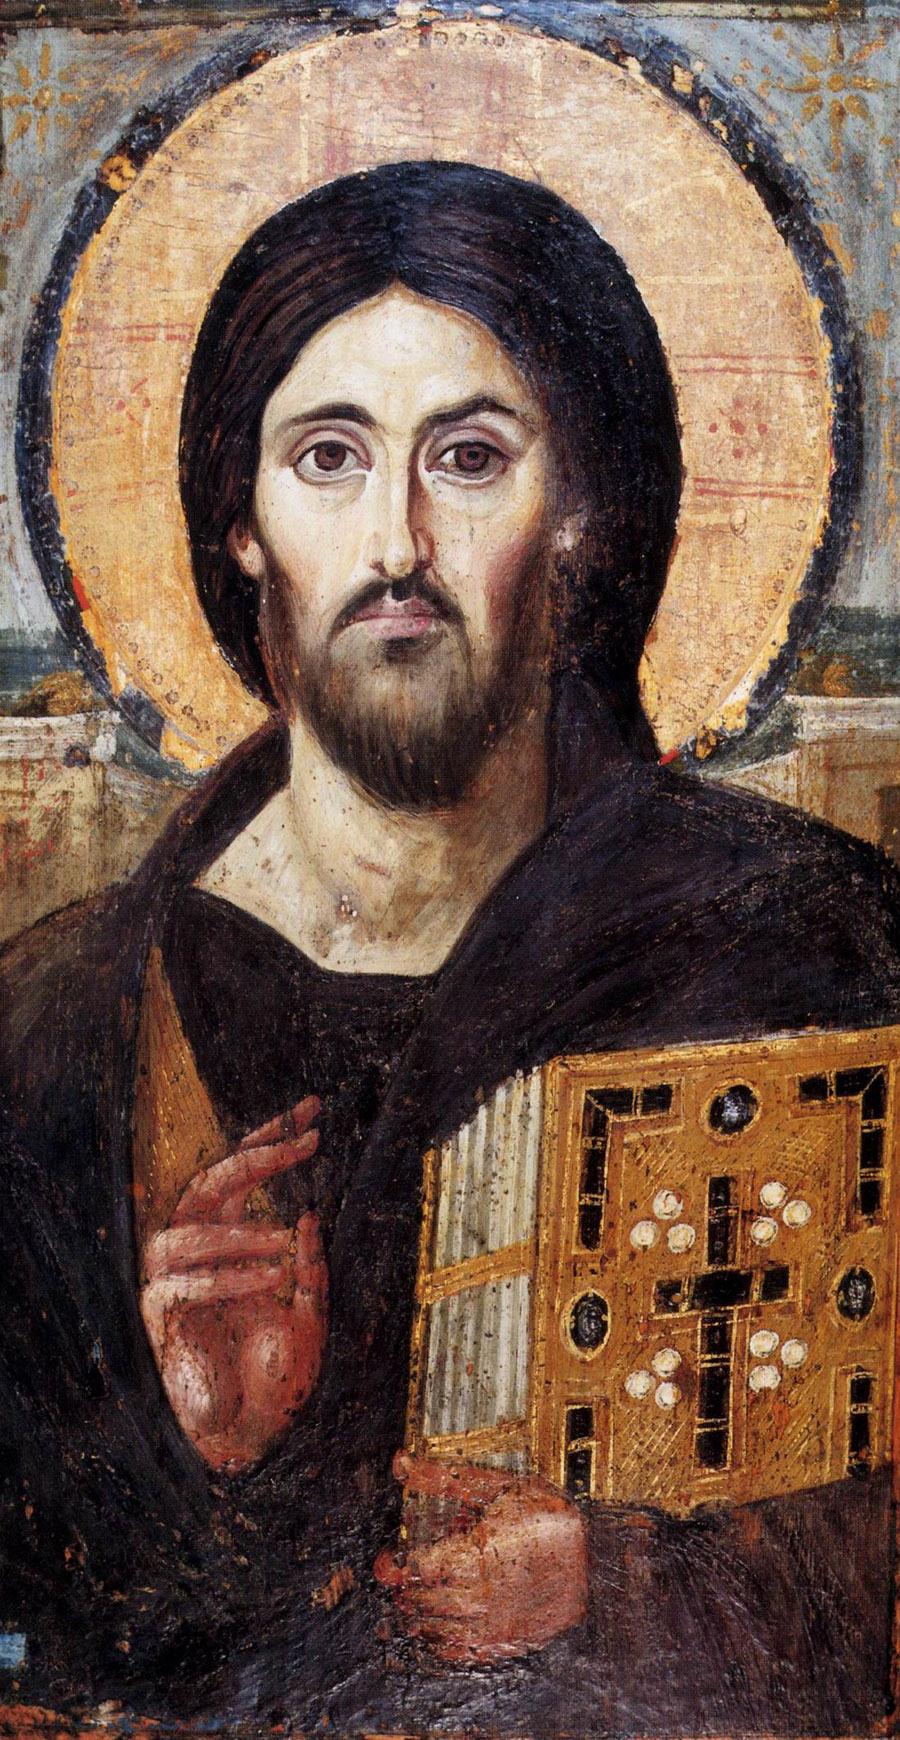 christ-pantocrator-monastery-mount-sinai-egypt-carulmare-cc